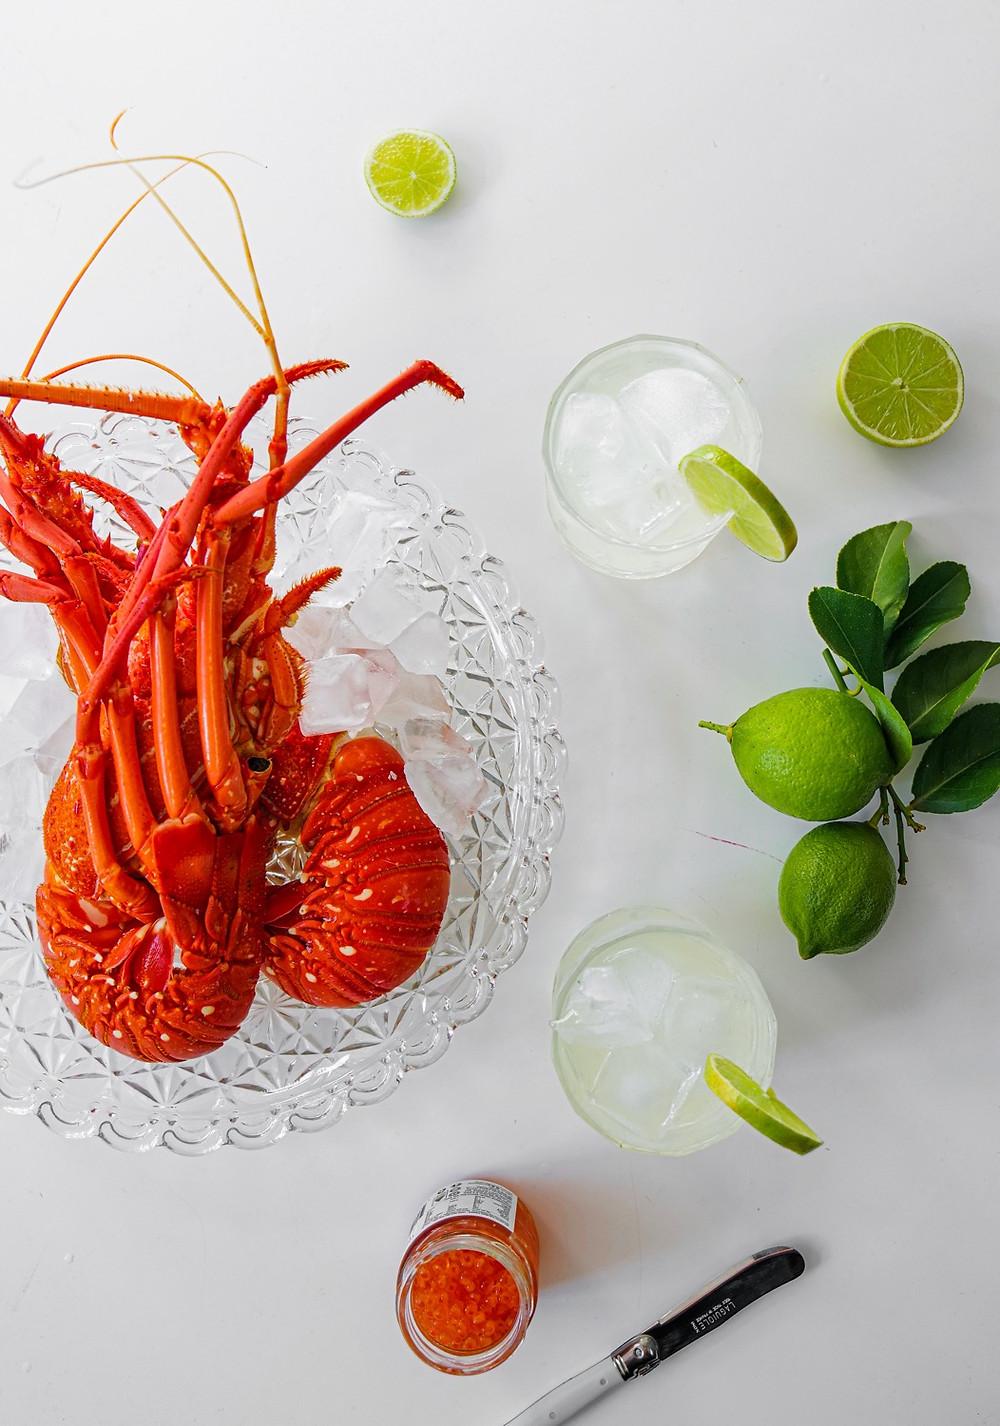 Lobster, Hampers, Home Delivery